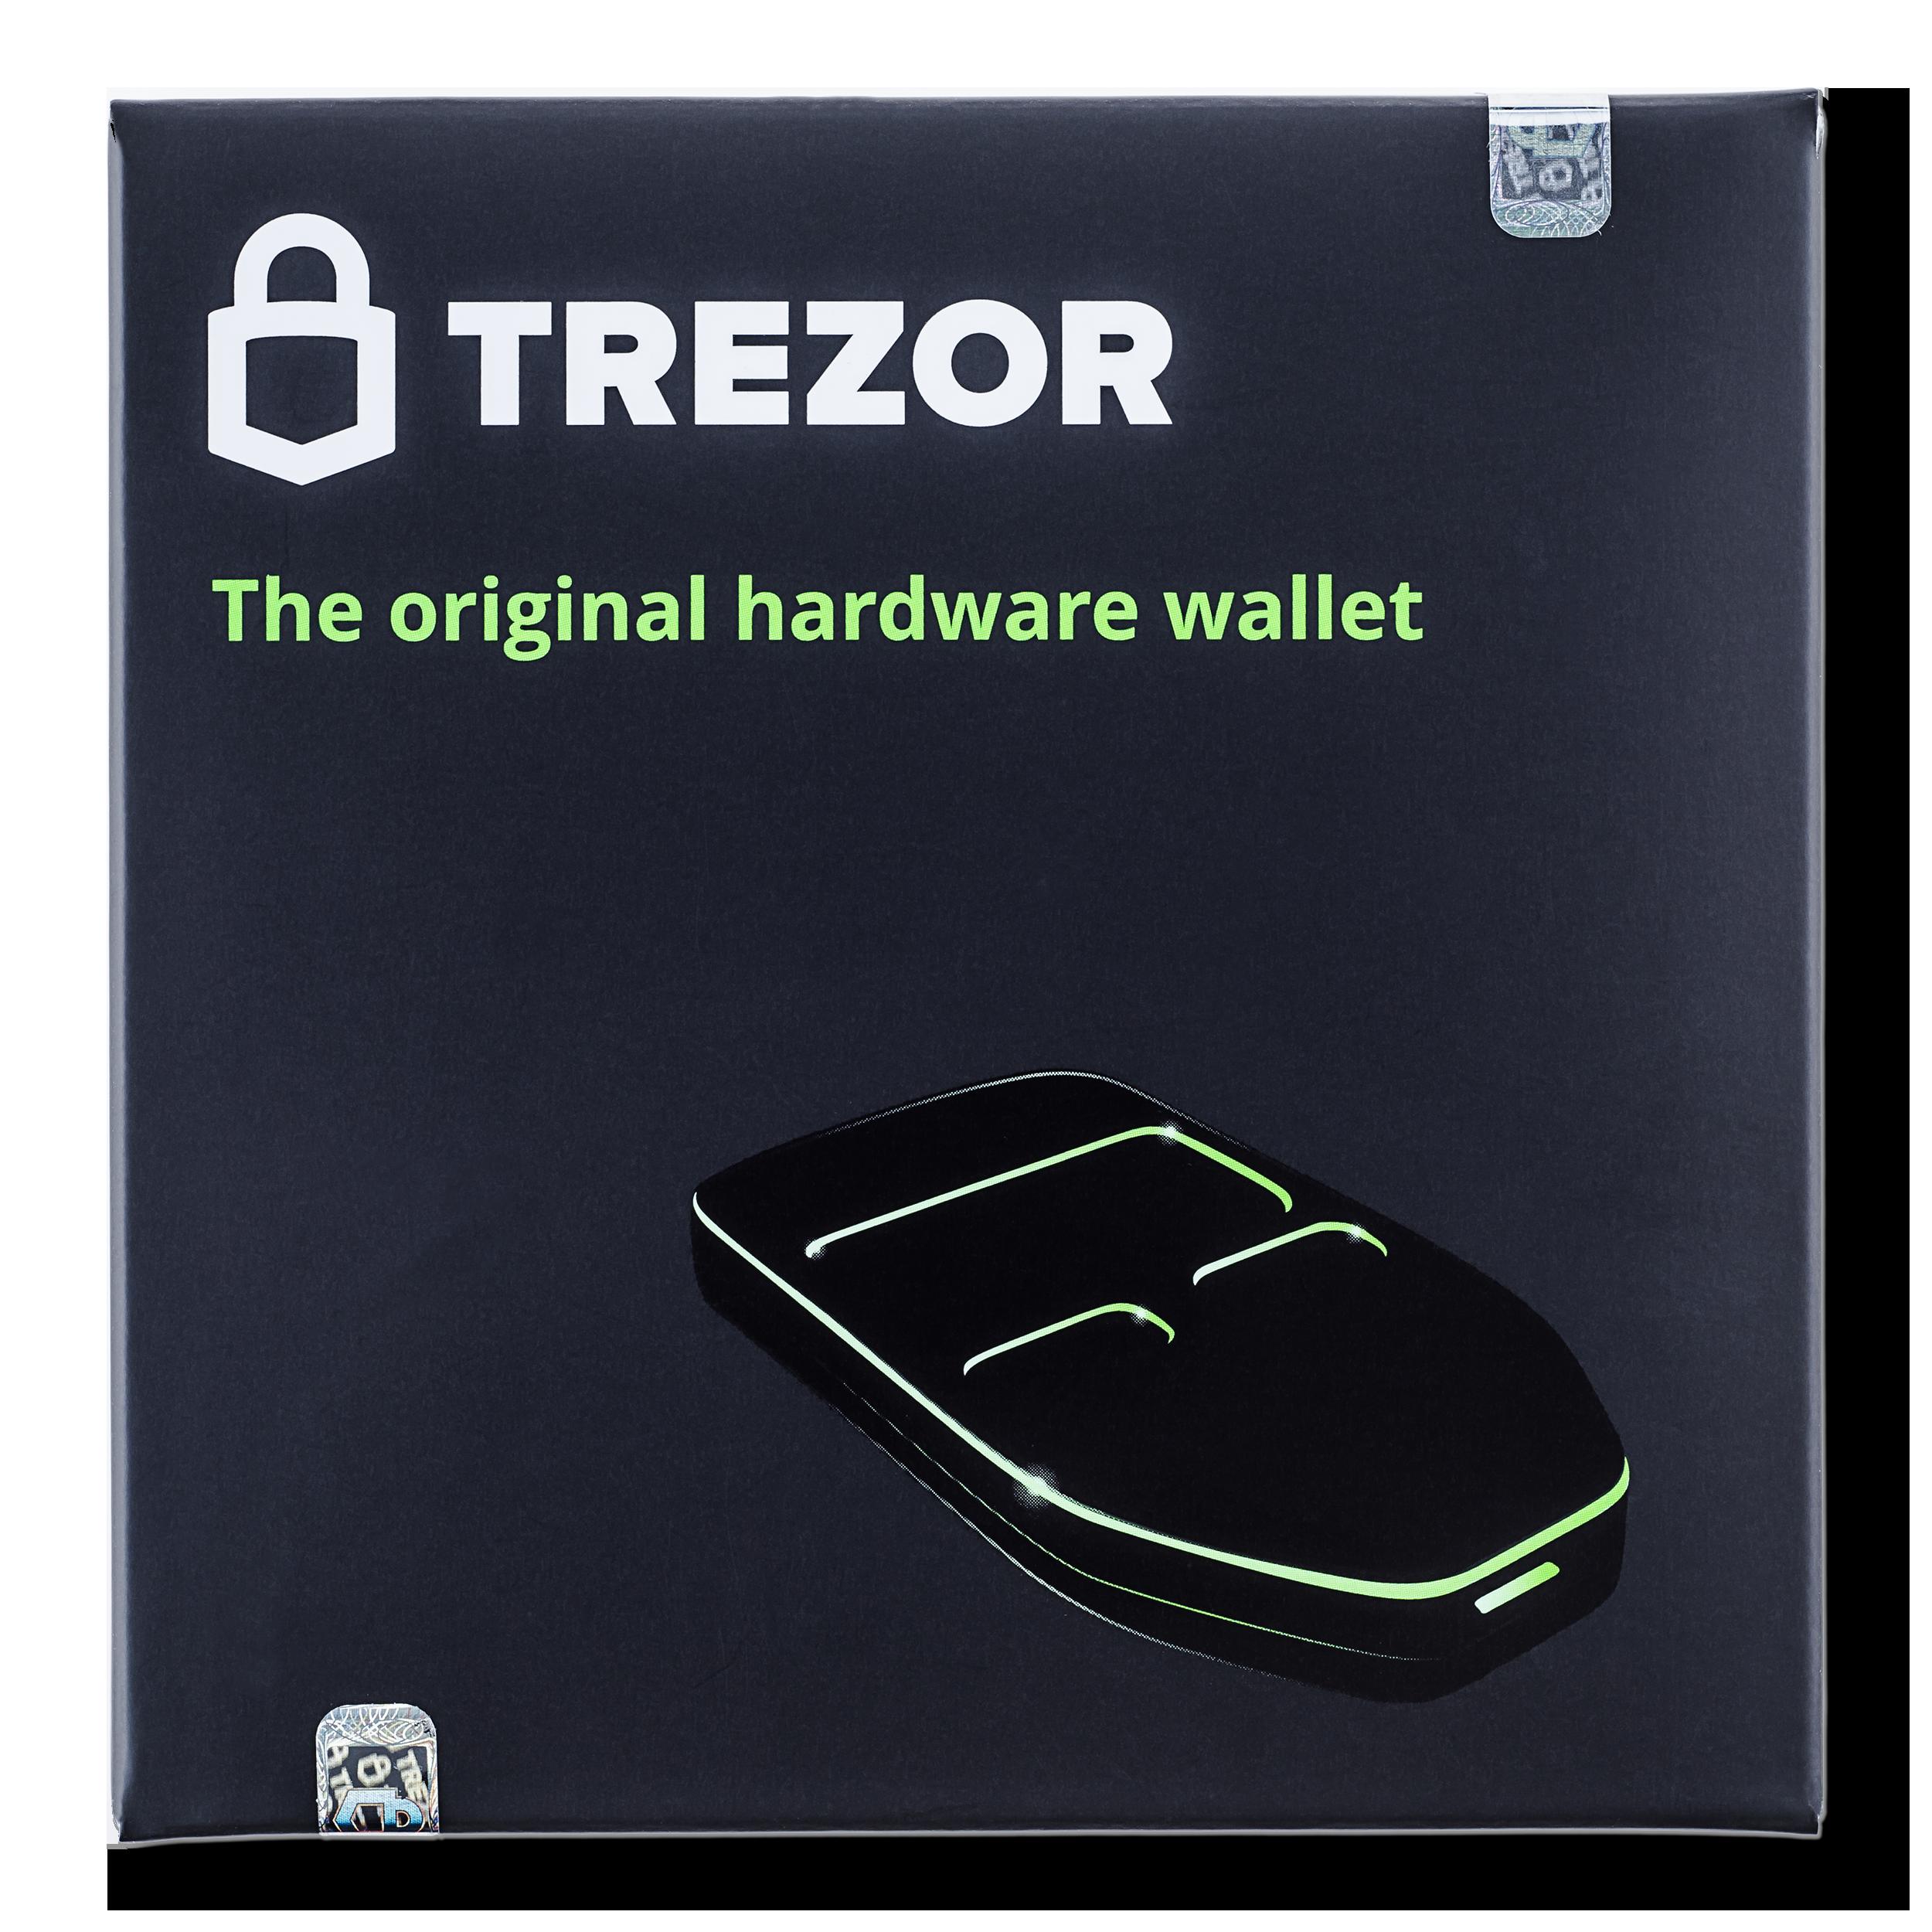 trezor_one_box_001.png